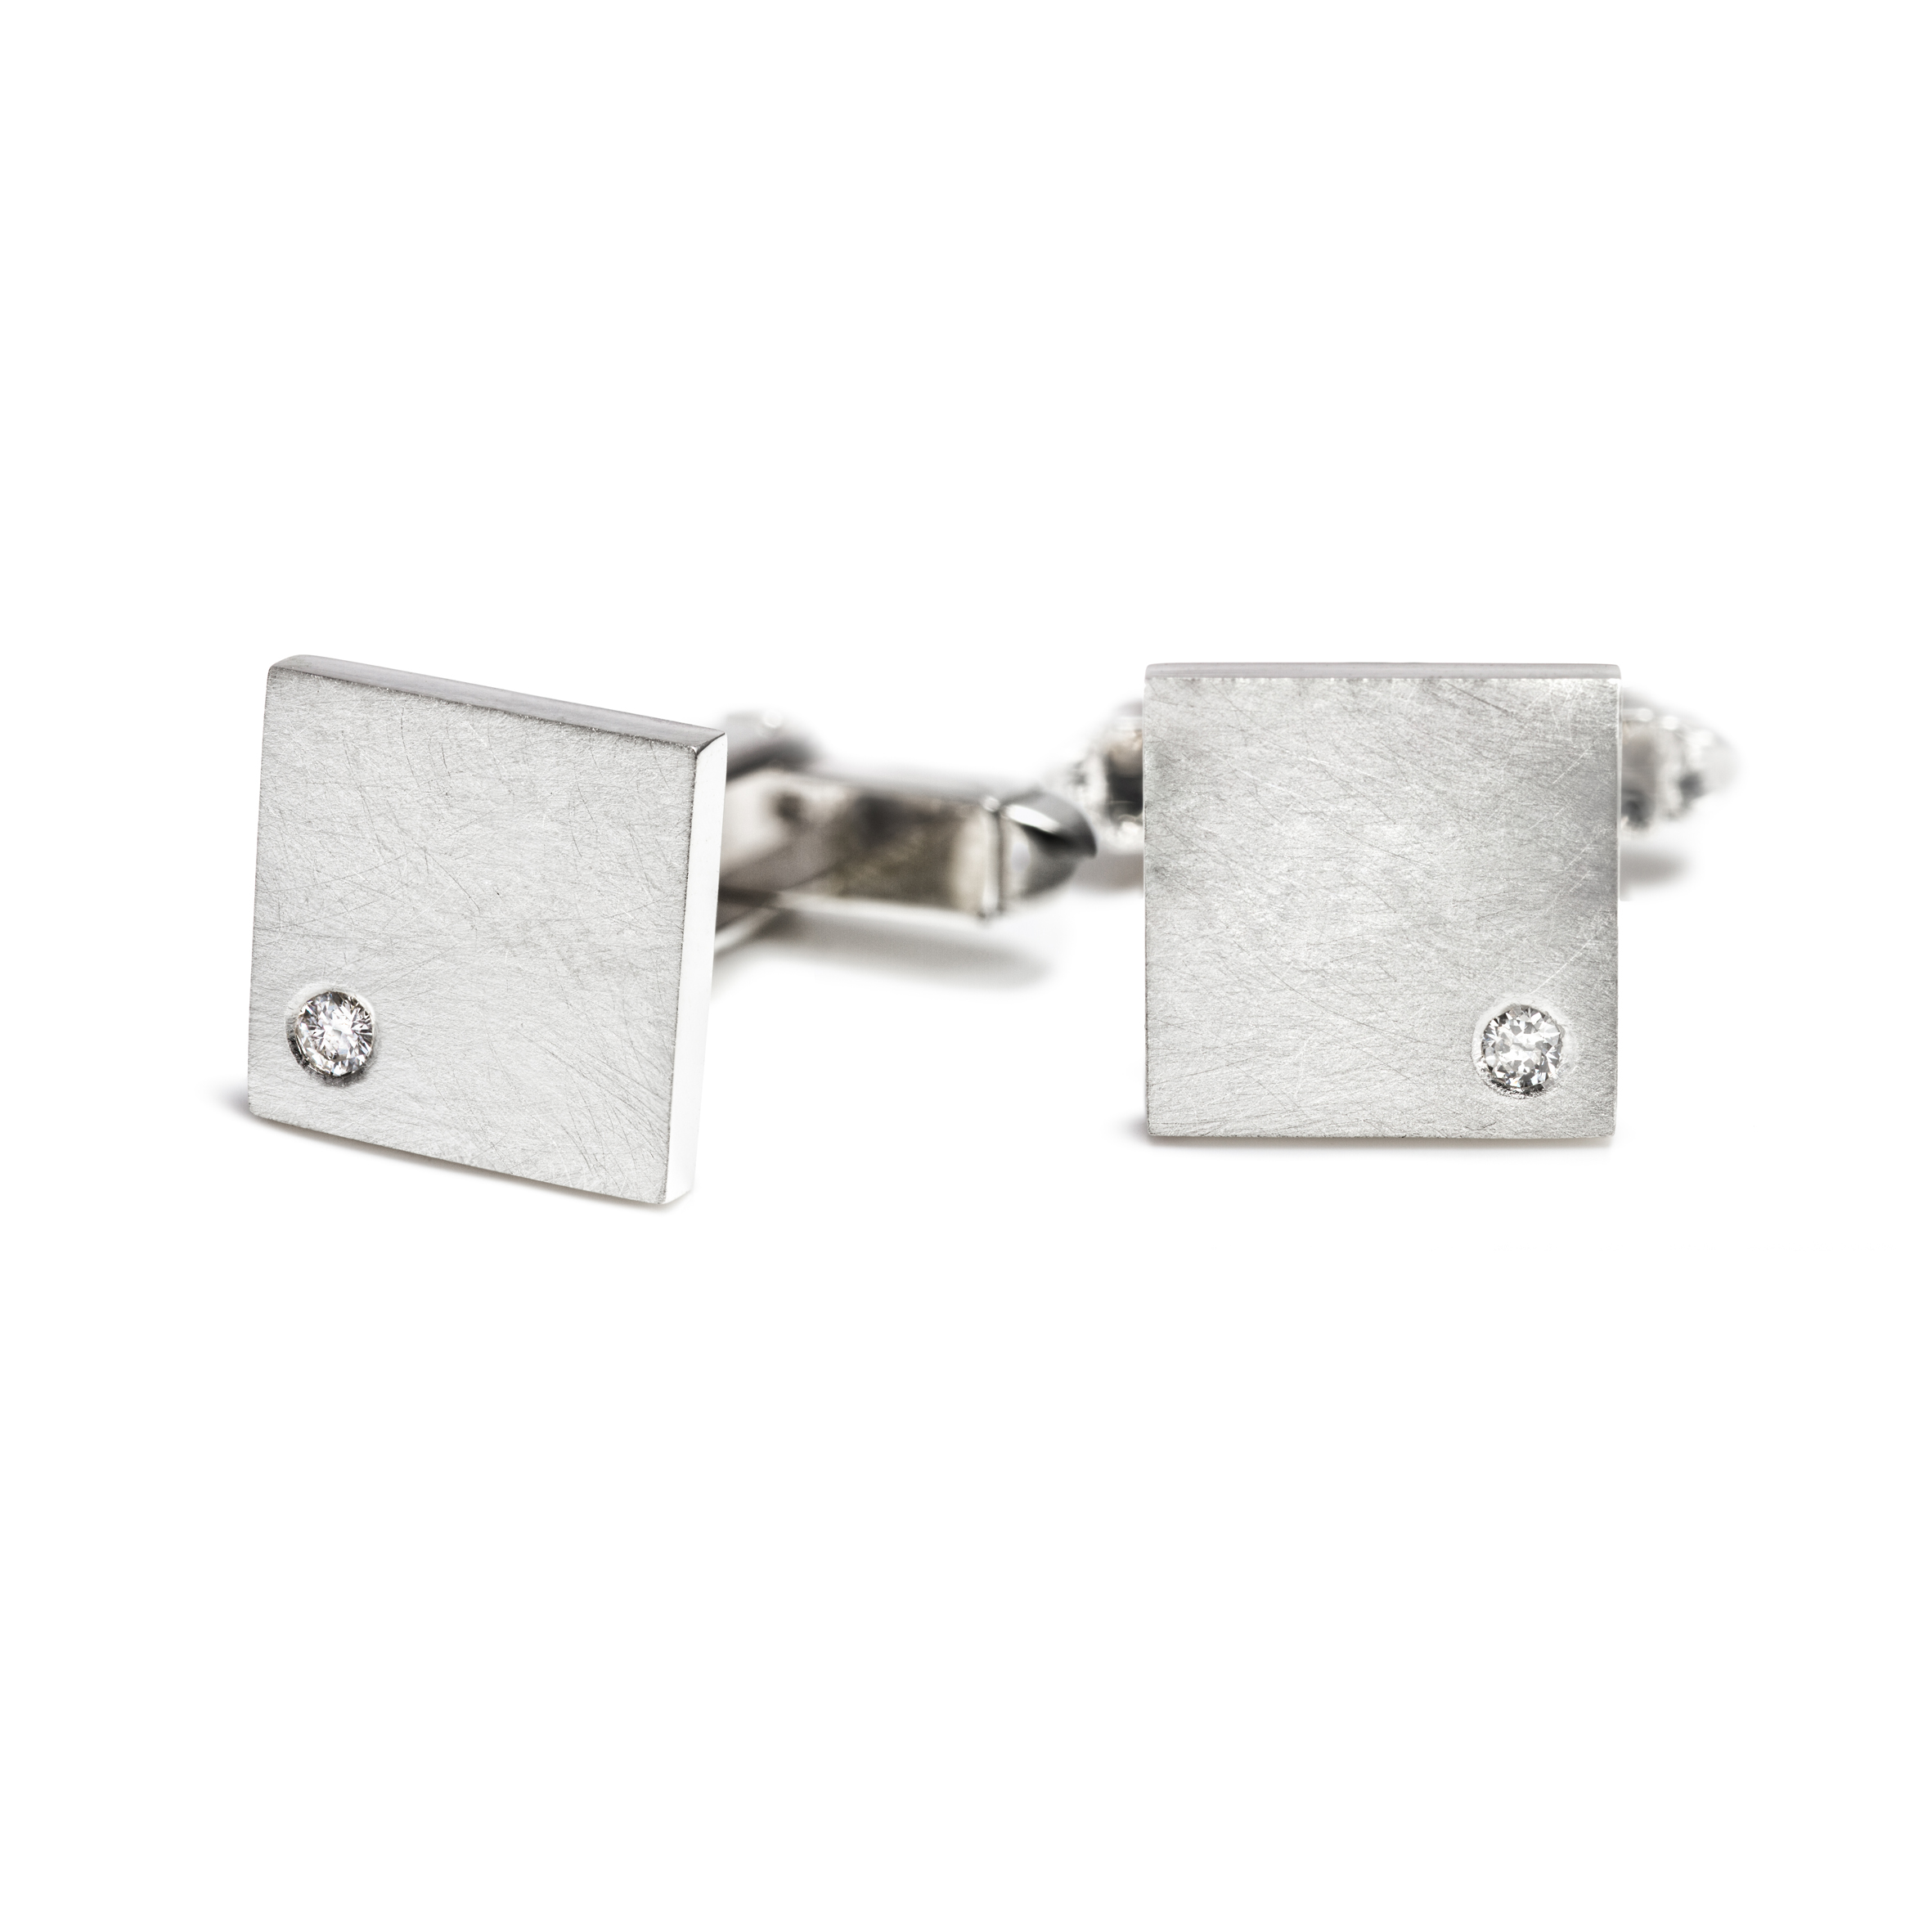 Bespoke silver and diamond cufflink commission